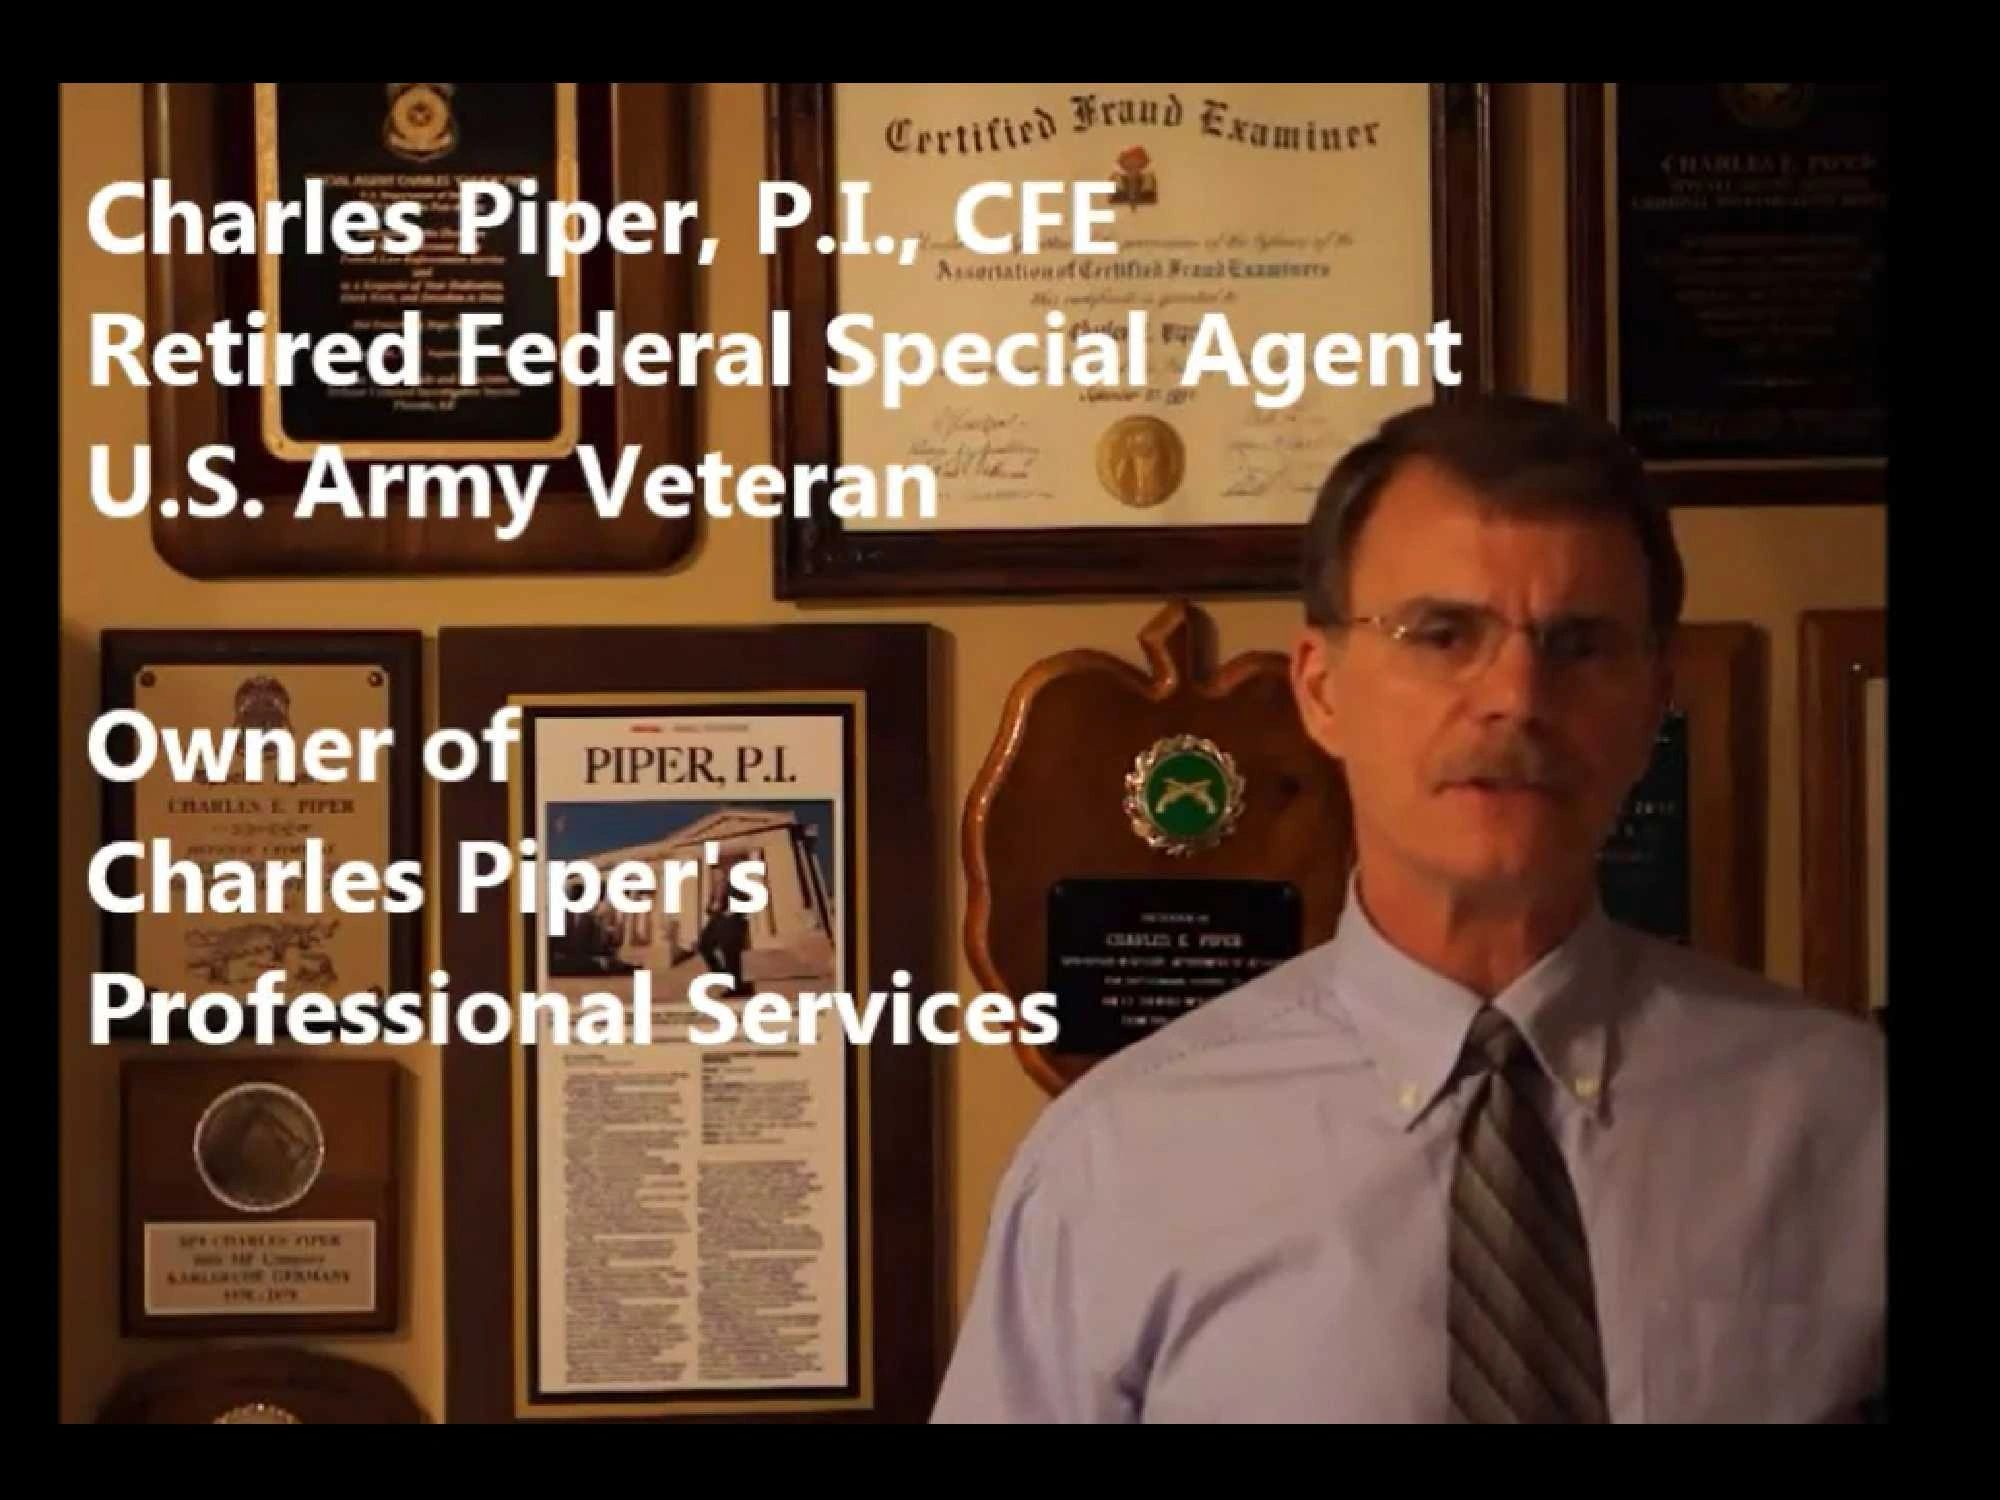 Memphis Private Investigator - Charles Piper's Professional